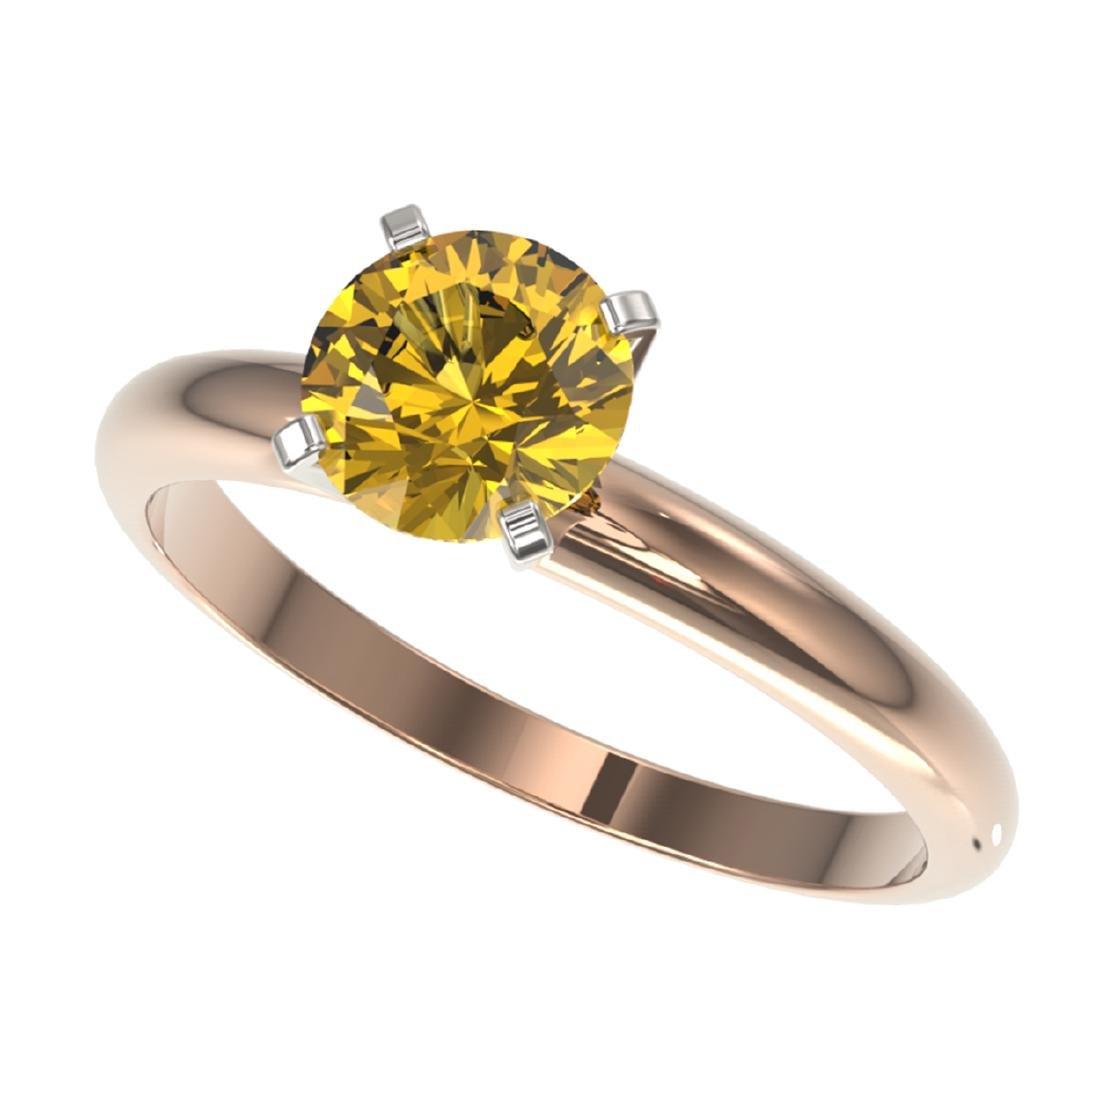 1.25 ctw Intense Yellow Diamond Solitaire Ring 10K Rose